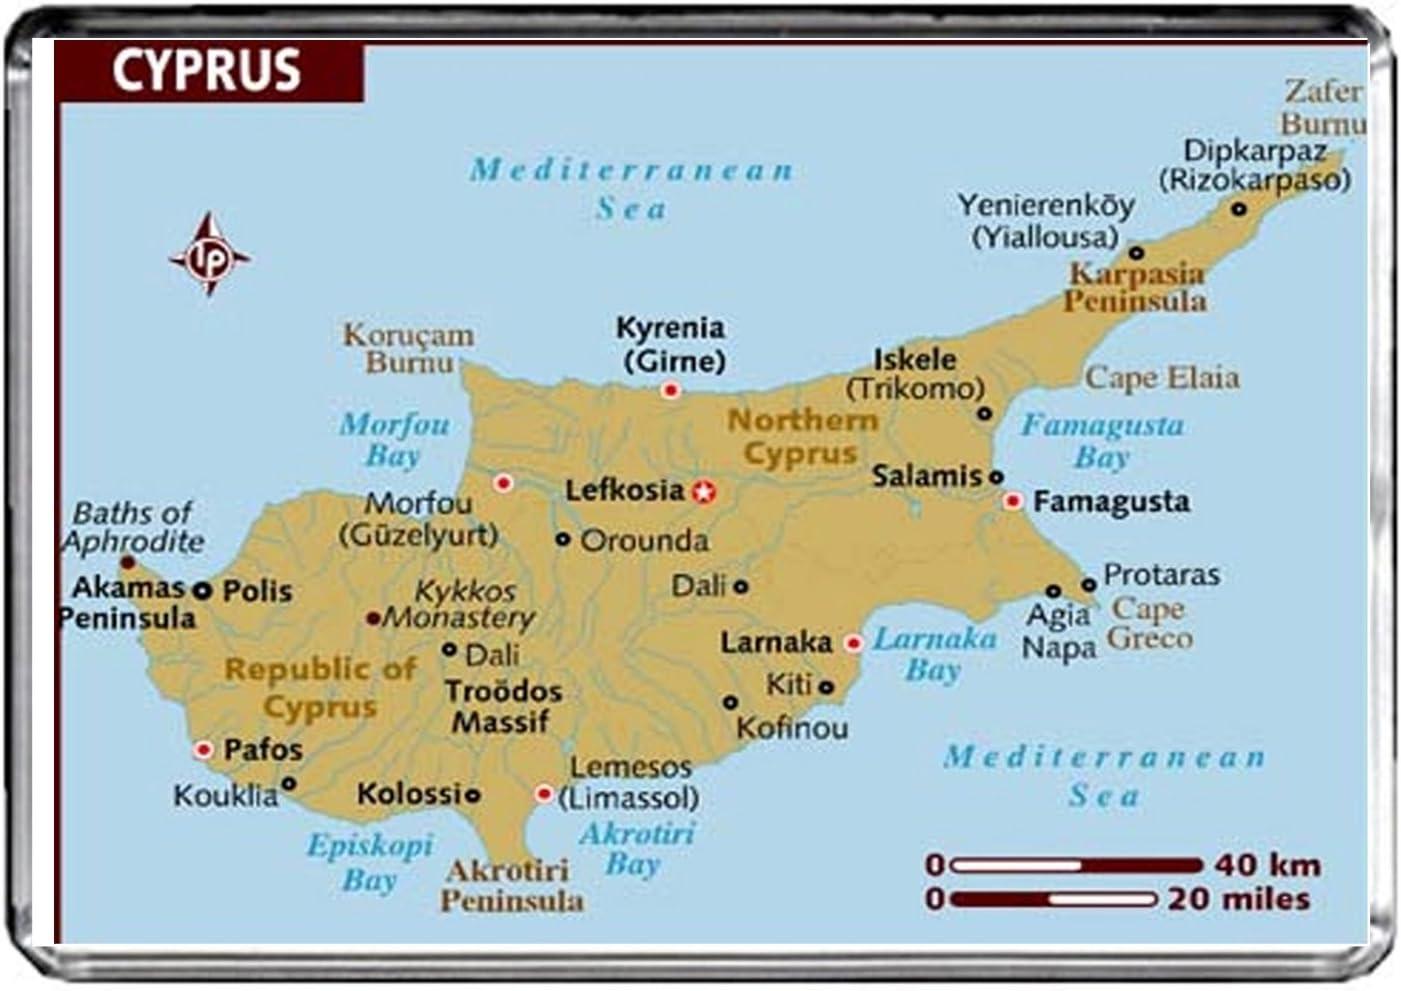 M053 MAP OF CYPRUS FRIDGE MAGNET CYPRUS TRAVEL REFRIGERATOR MAGNET